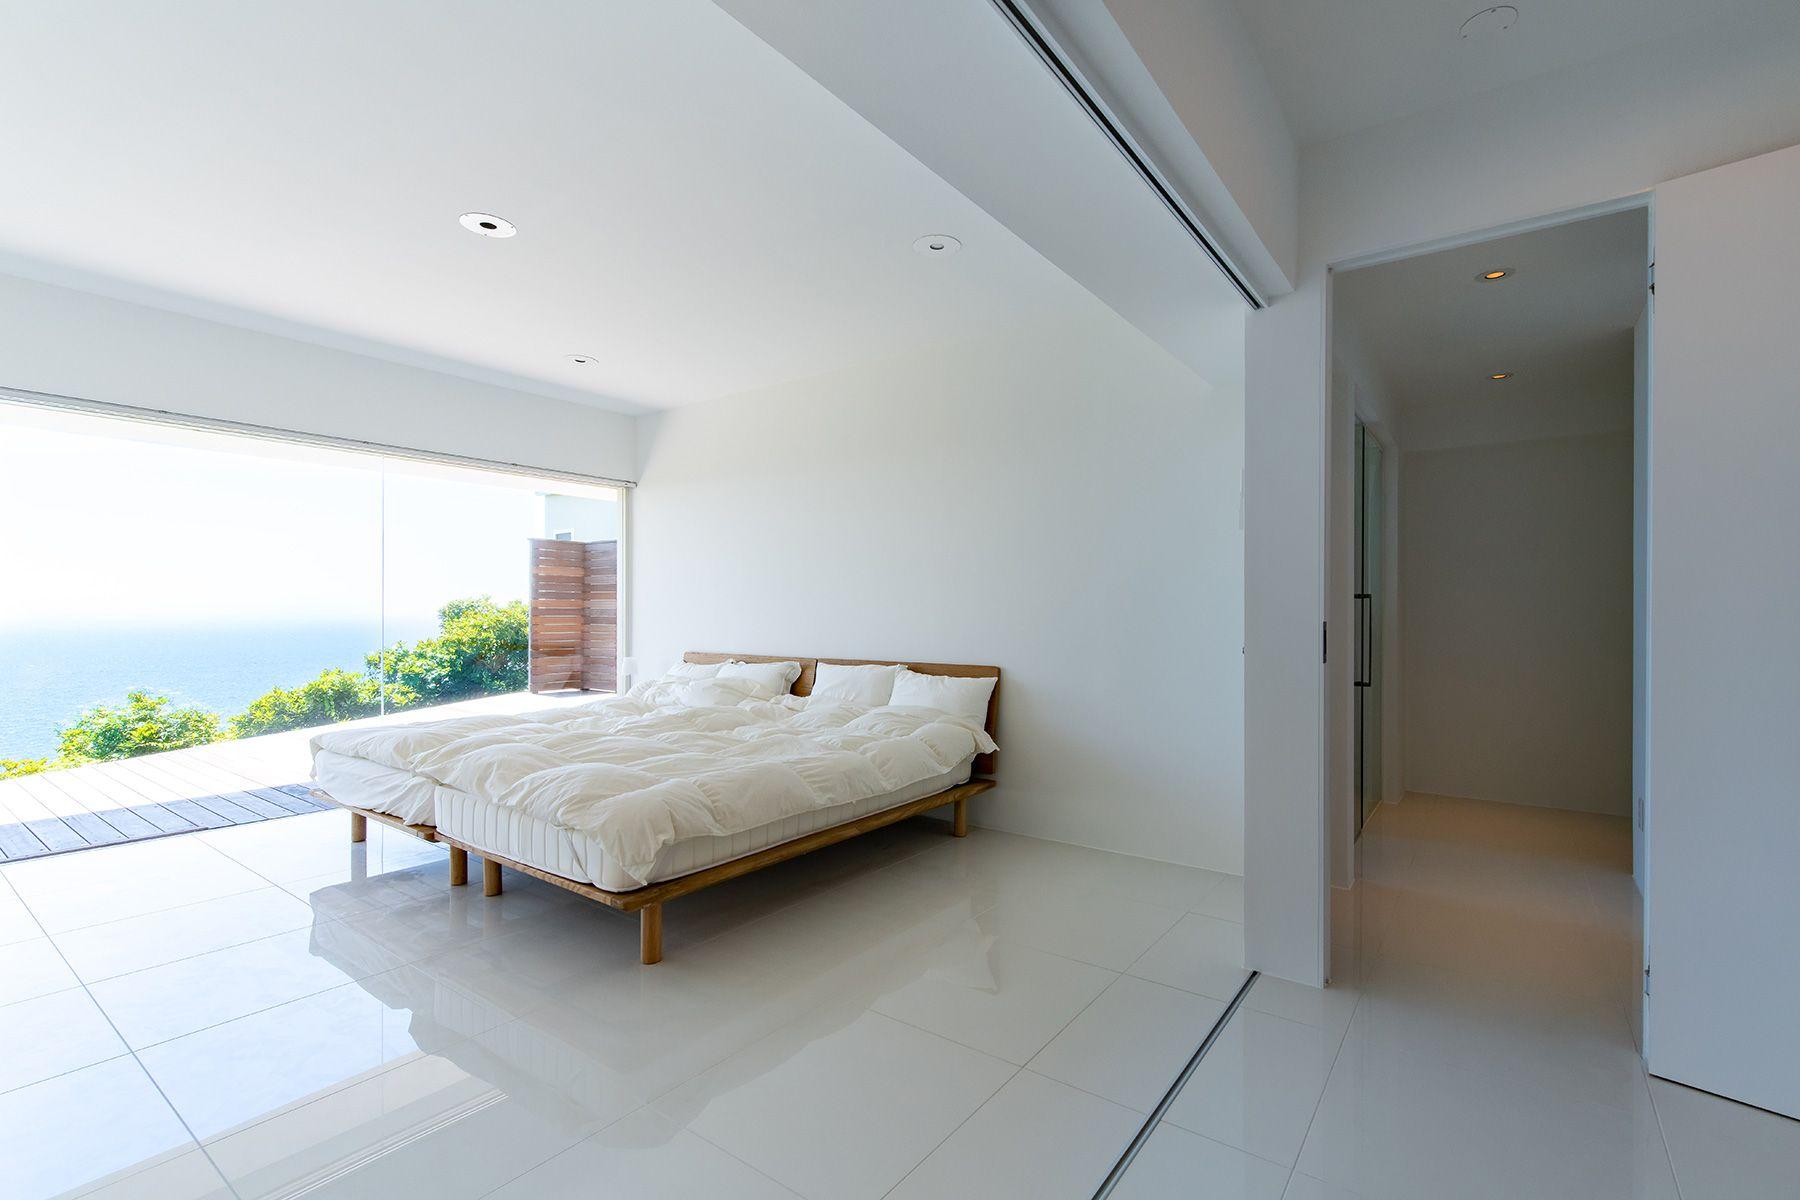 CENTERBOARD HAYAMA (センターボード ハヤマ)1F ベッドルーム